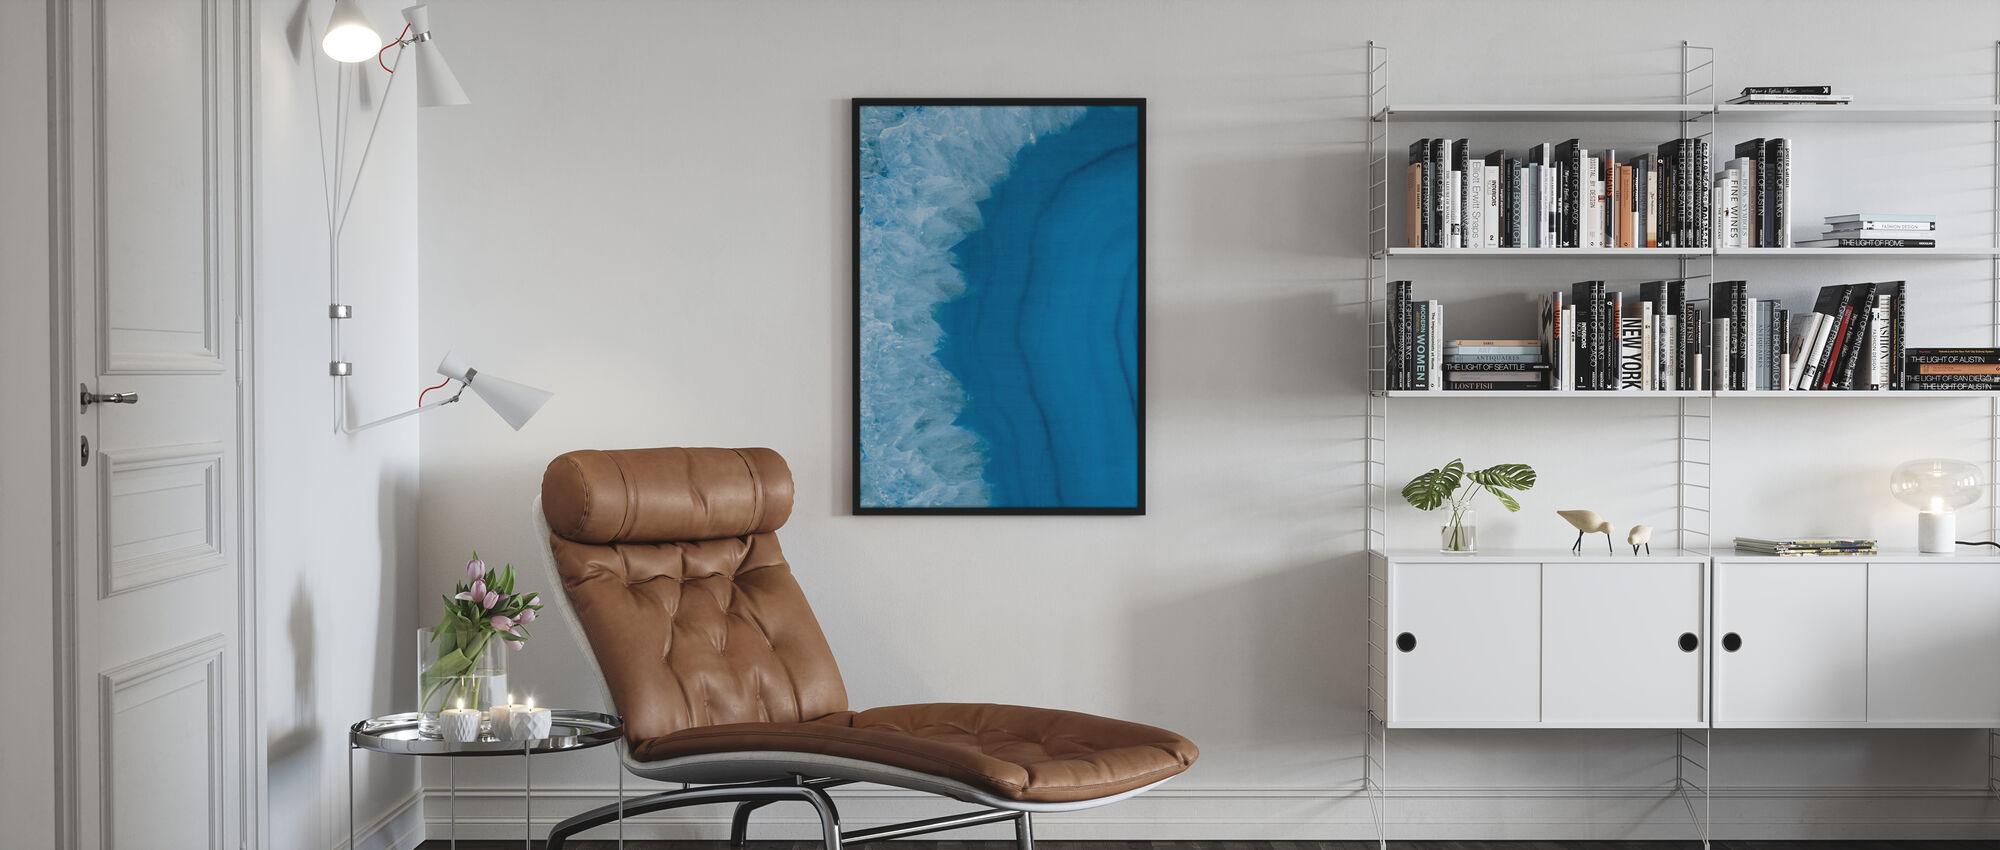 Agate Geode I - Plakat - Stue